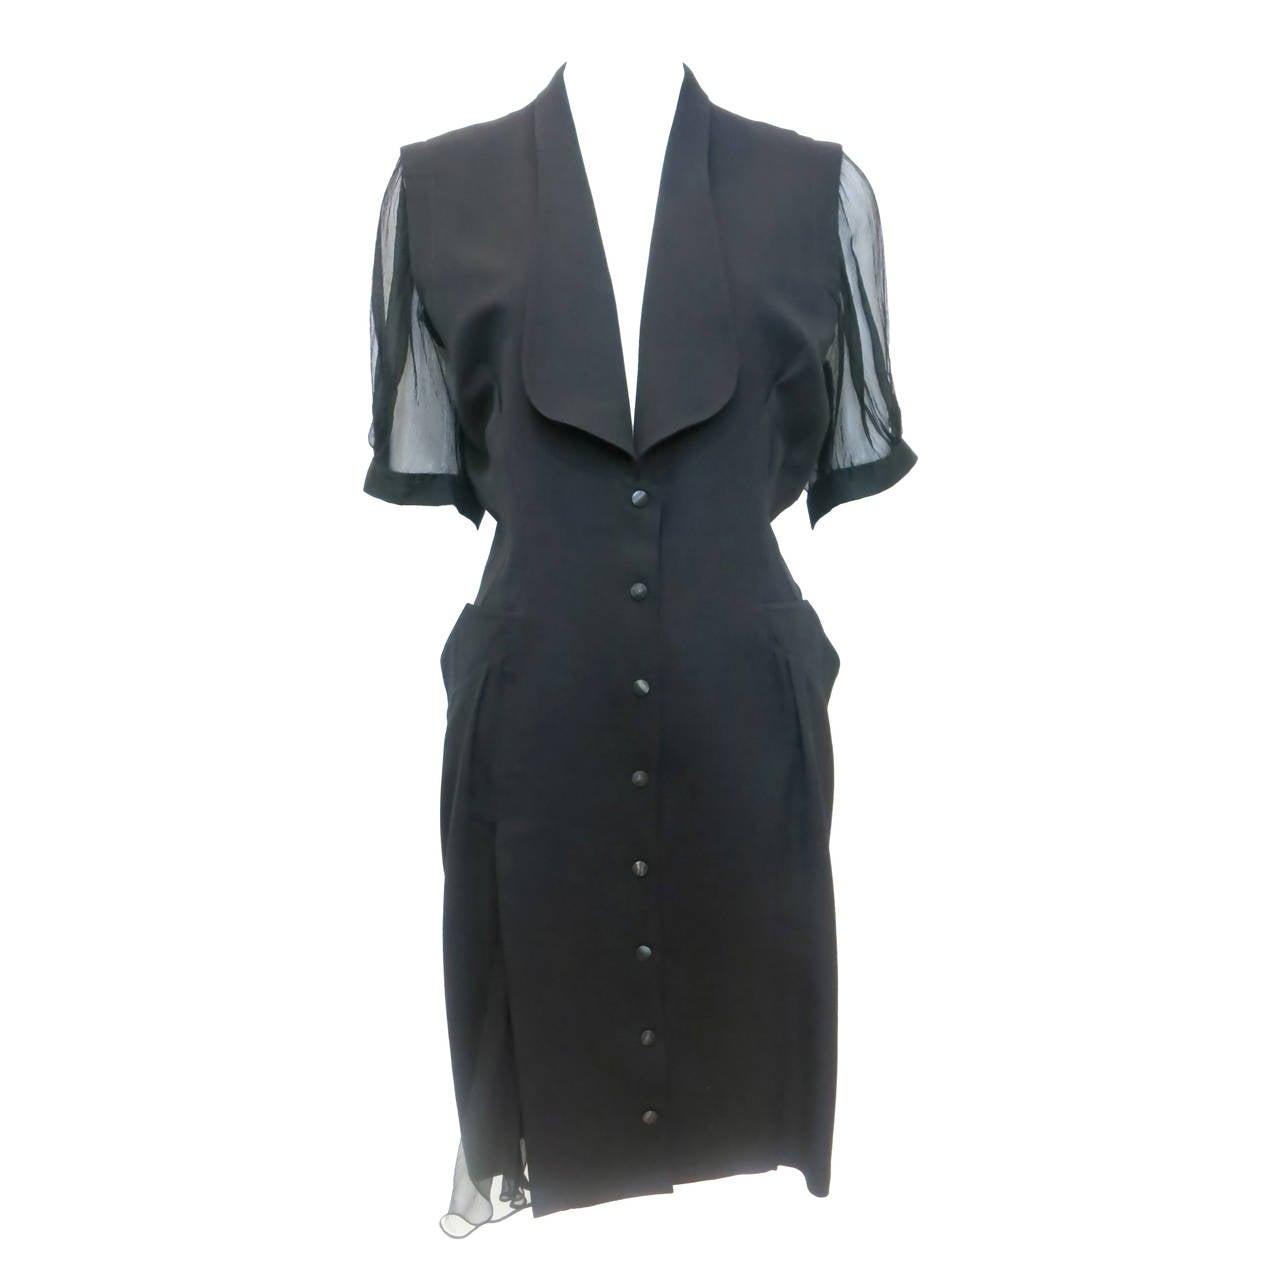 Thierry Mugler Black Shirt Dress, 1980s  For Sale